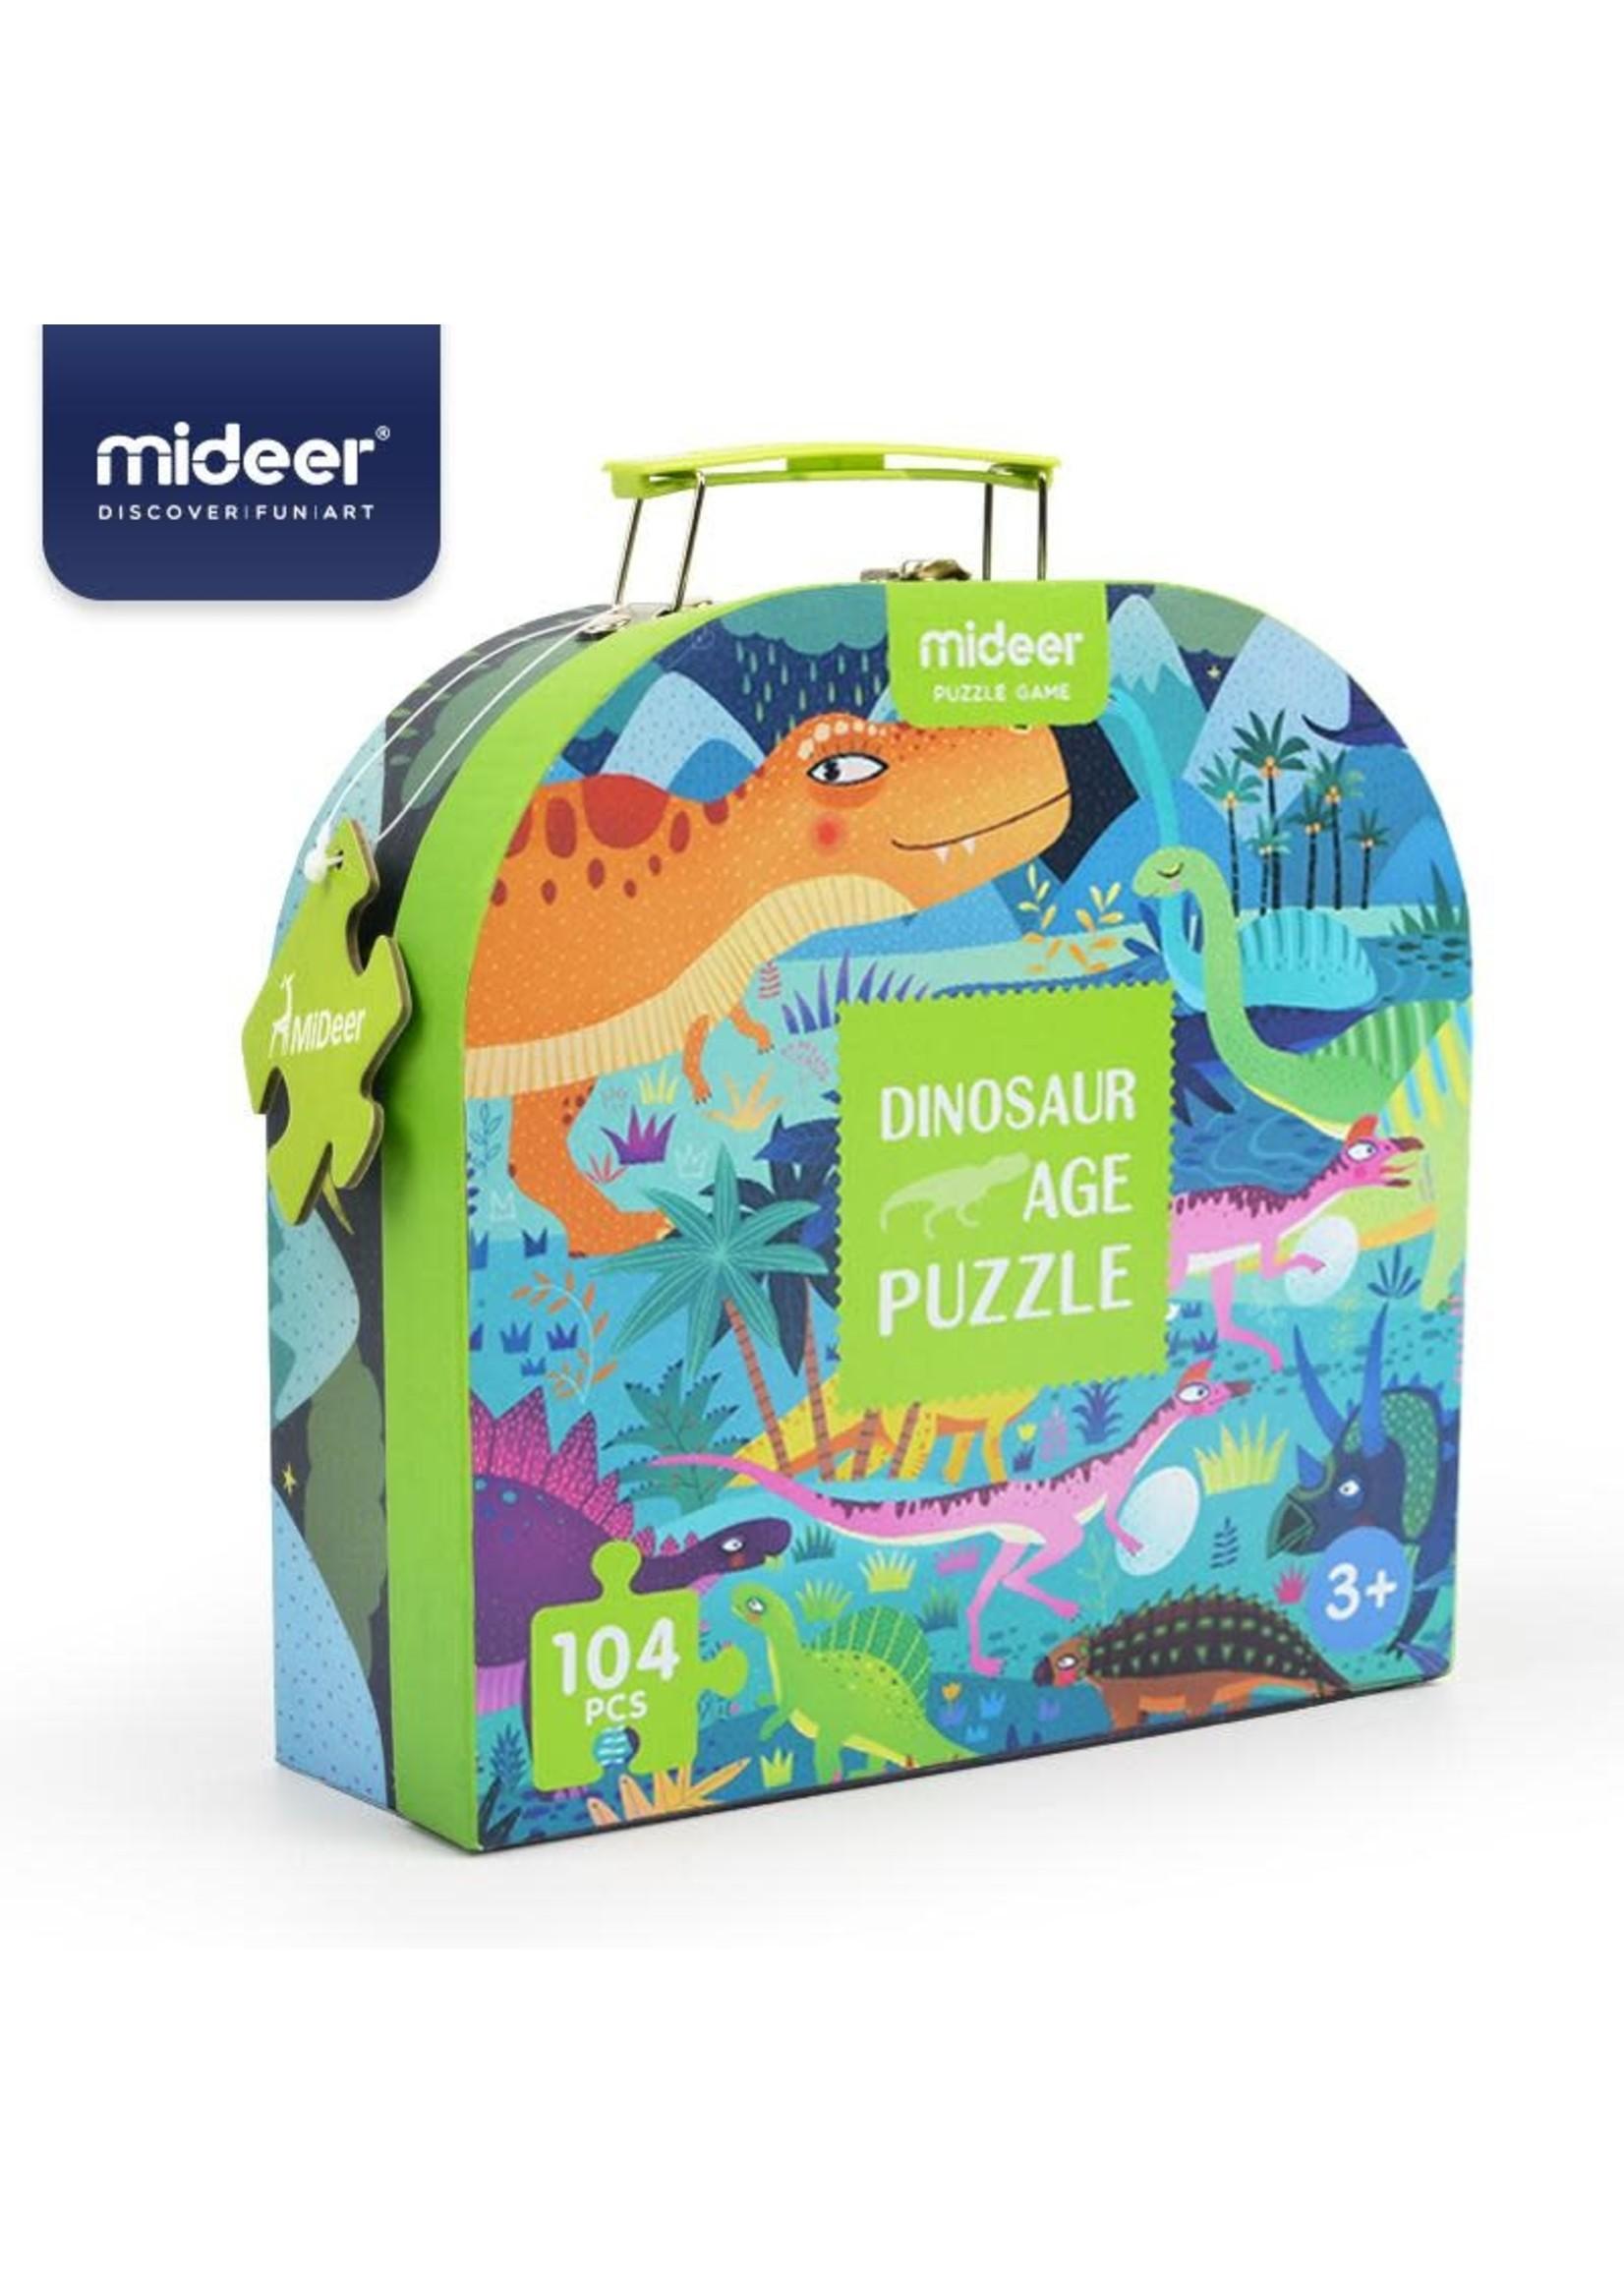 Mideer Mideer Dino Age Puzzle (104 pcs)